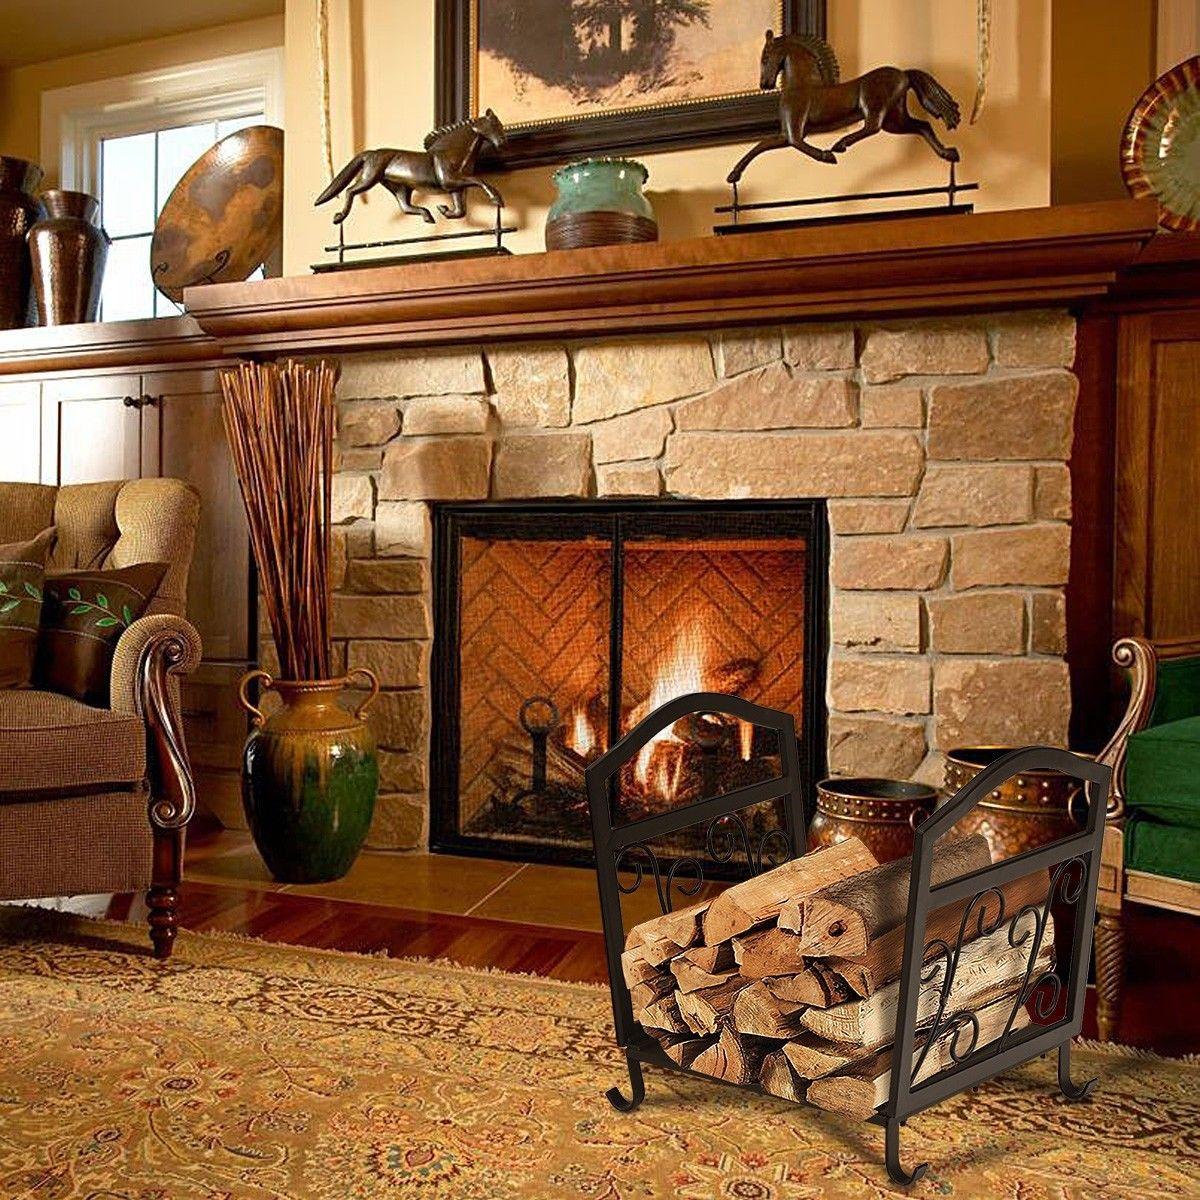 Fireplace Log Holder Wrought Iron Indoor Fire Wood Rack Wood